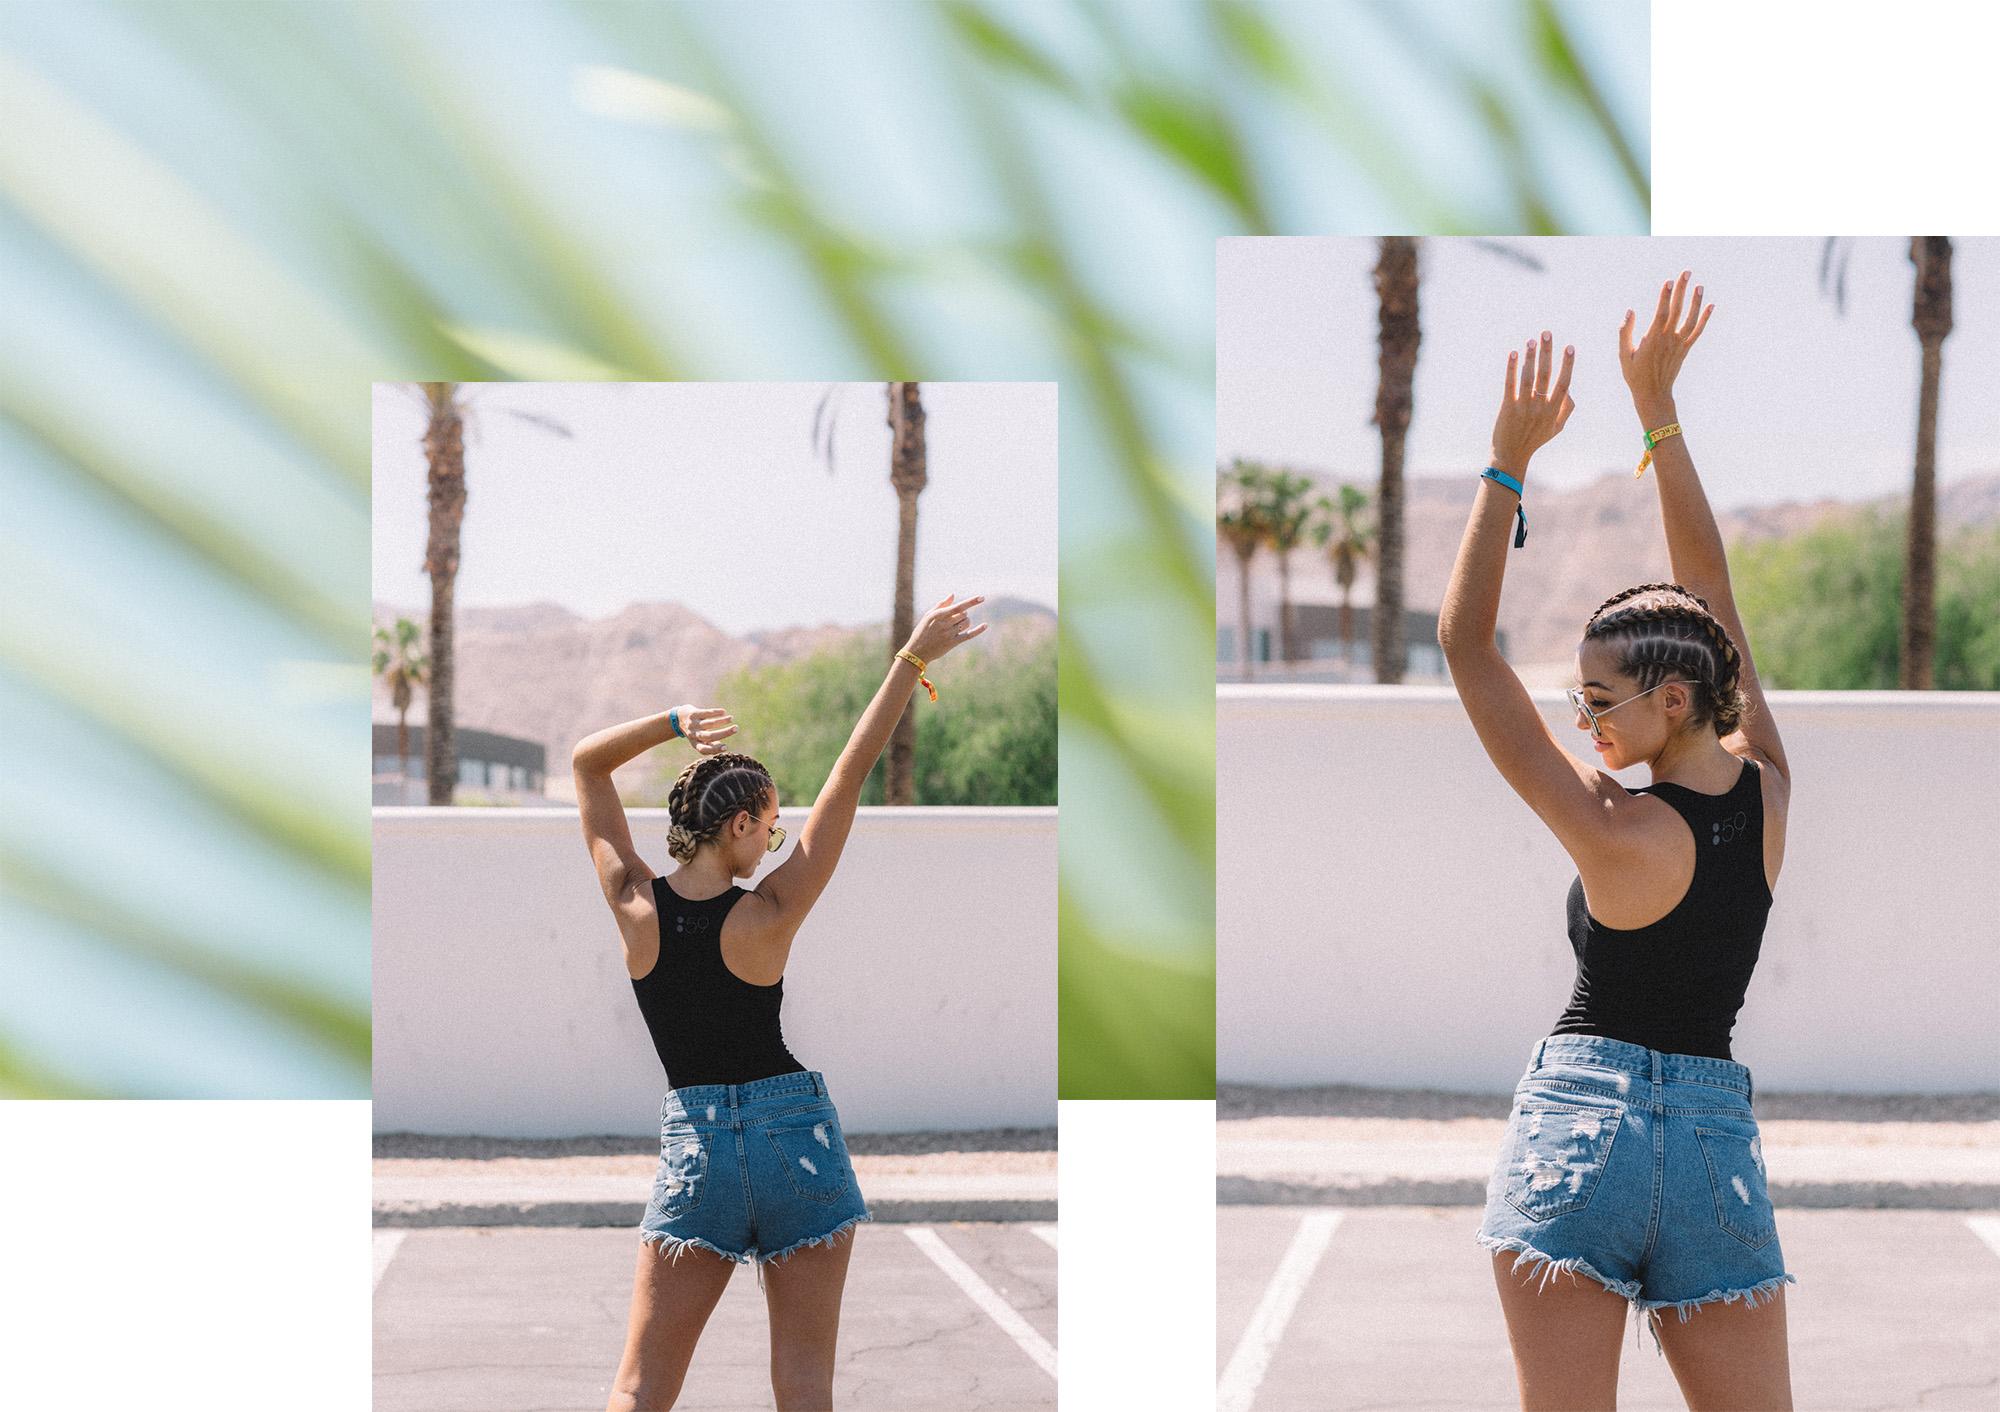 Sammy Robinson / Coachella x ghd hair